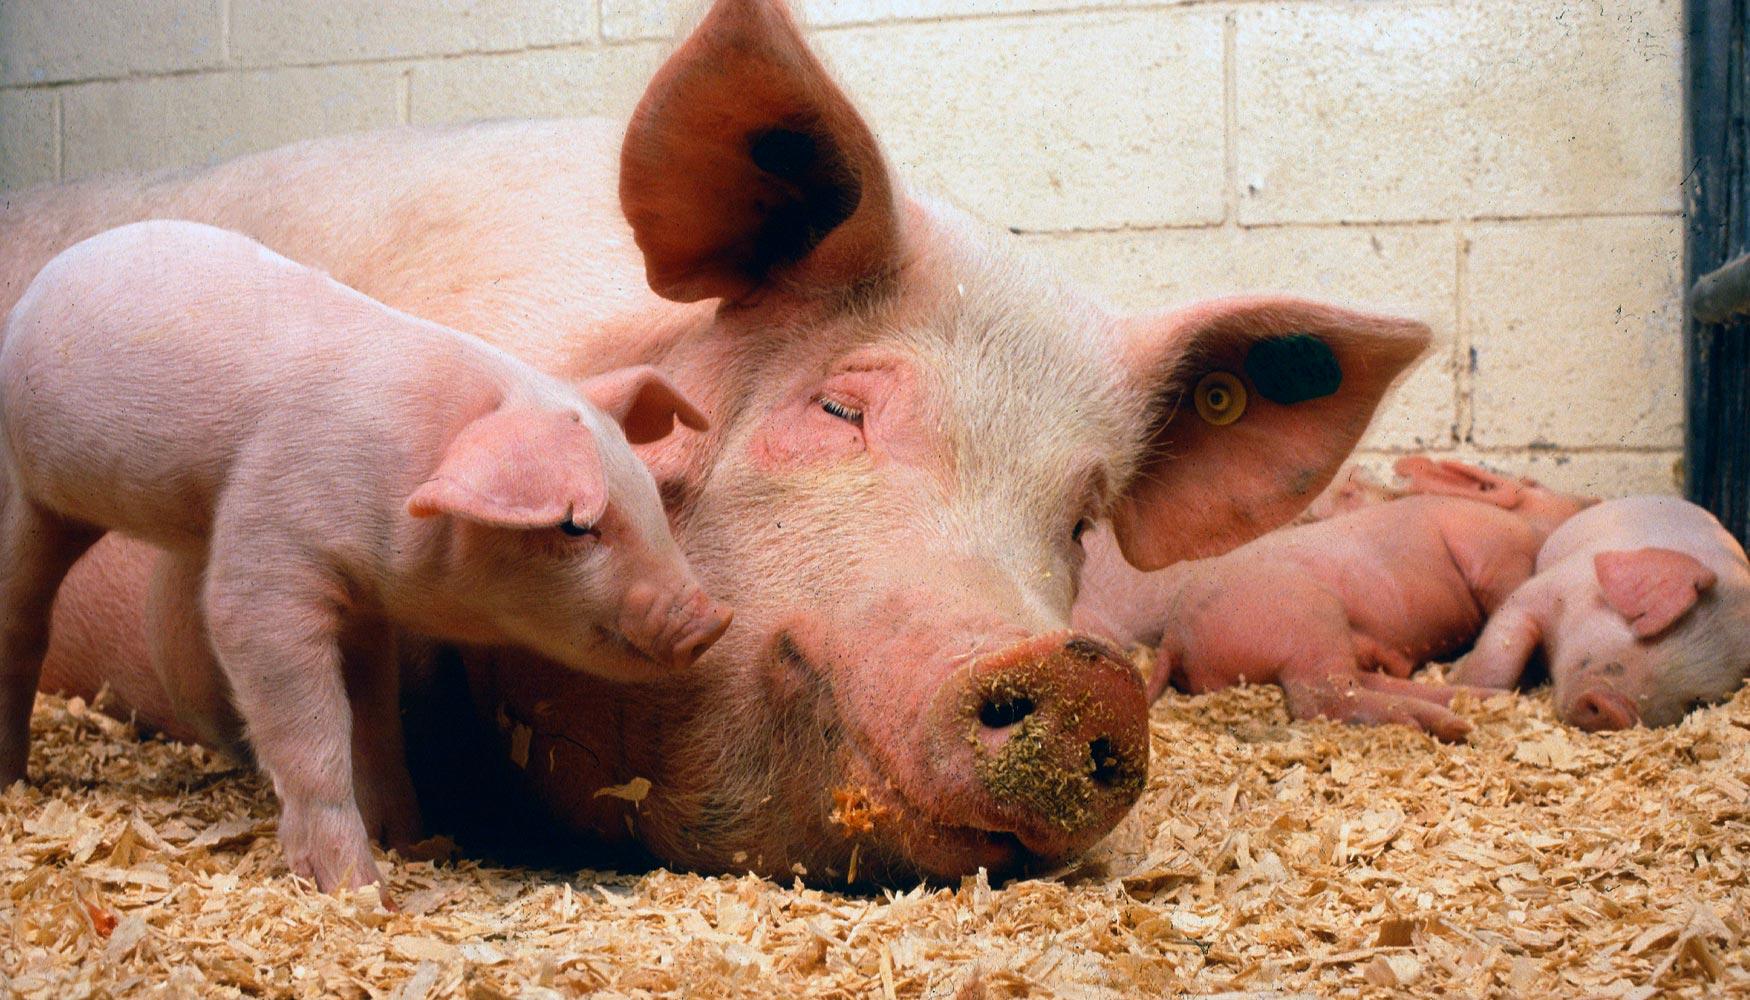 Industria cárnica discute su futuro ante el alza del veganismo